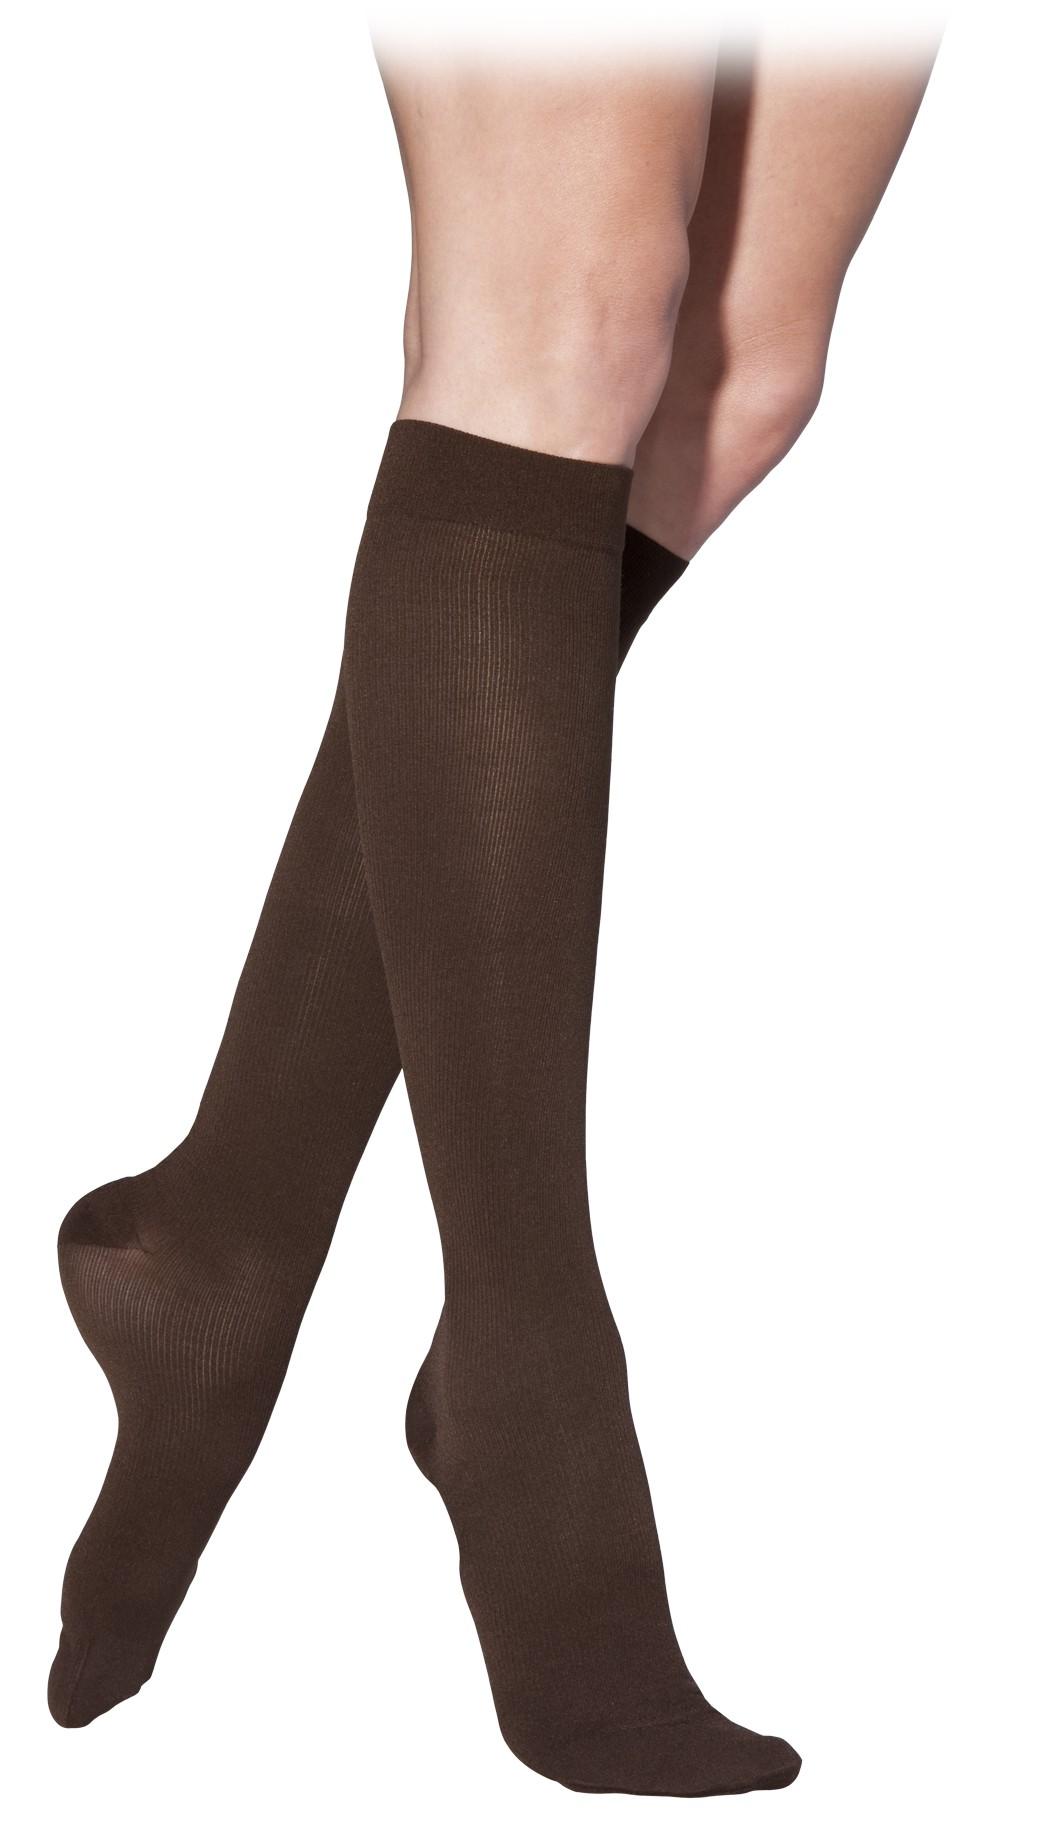 f34540ca71 Sigvaris Knee High Socks 23-32mmHg CII (762) - Body Plus